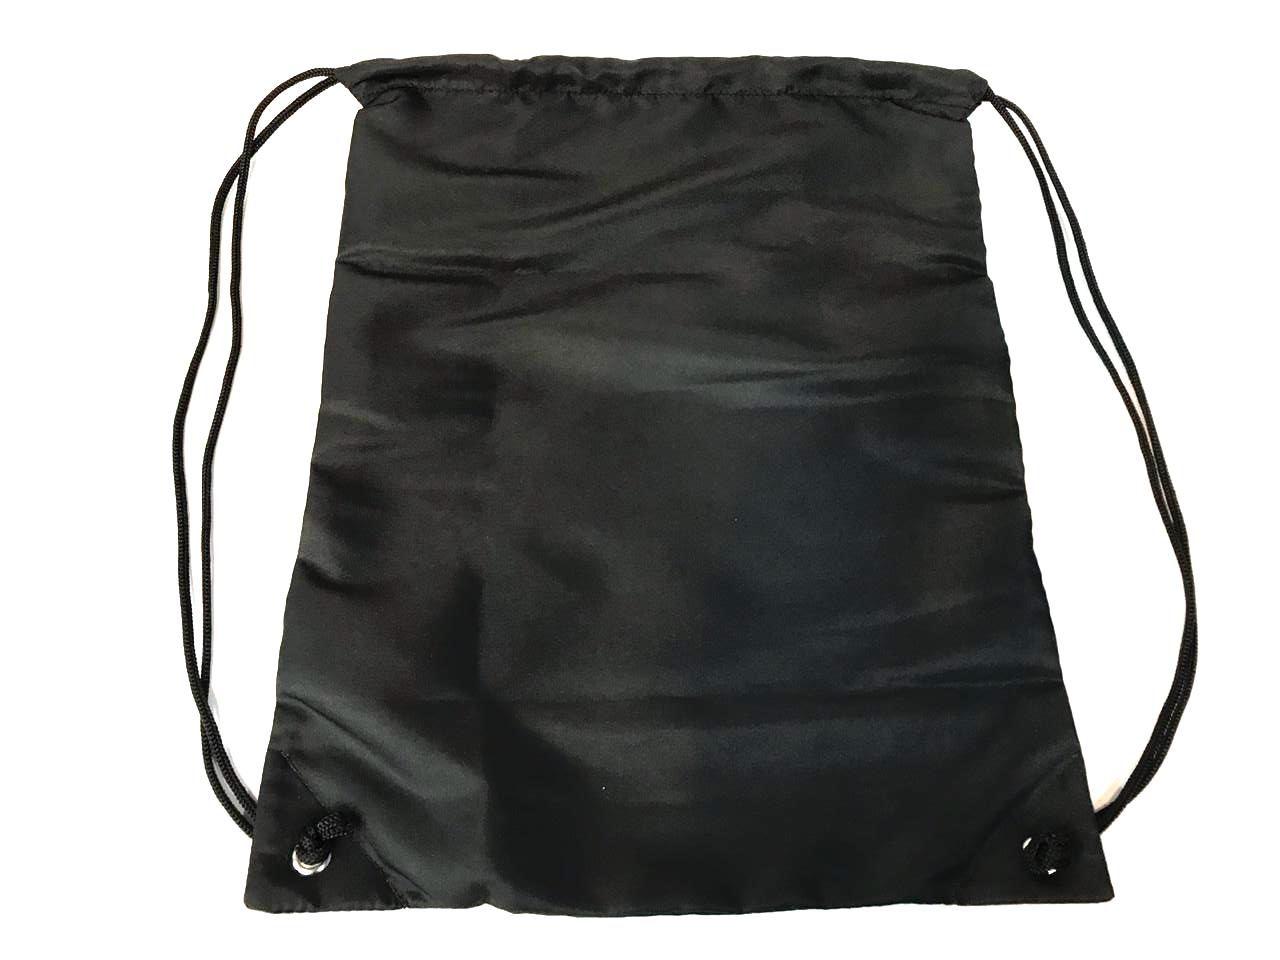 Mochila Nylon Bum Bag Santa Cruz Screaming Hand Preta